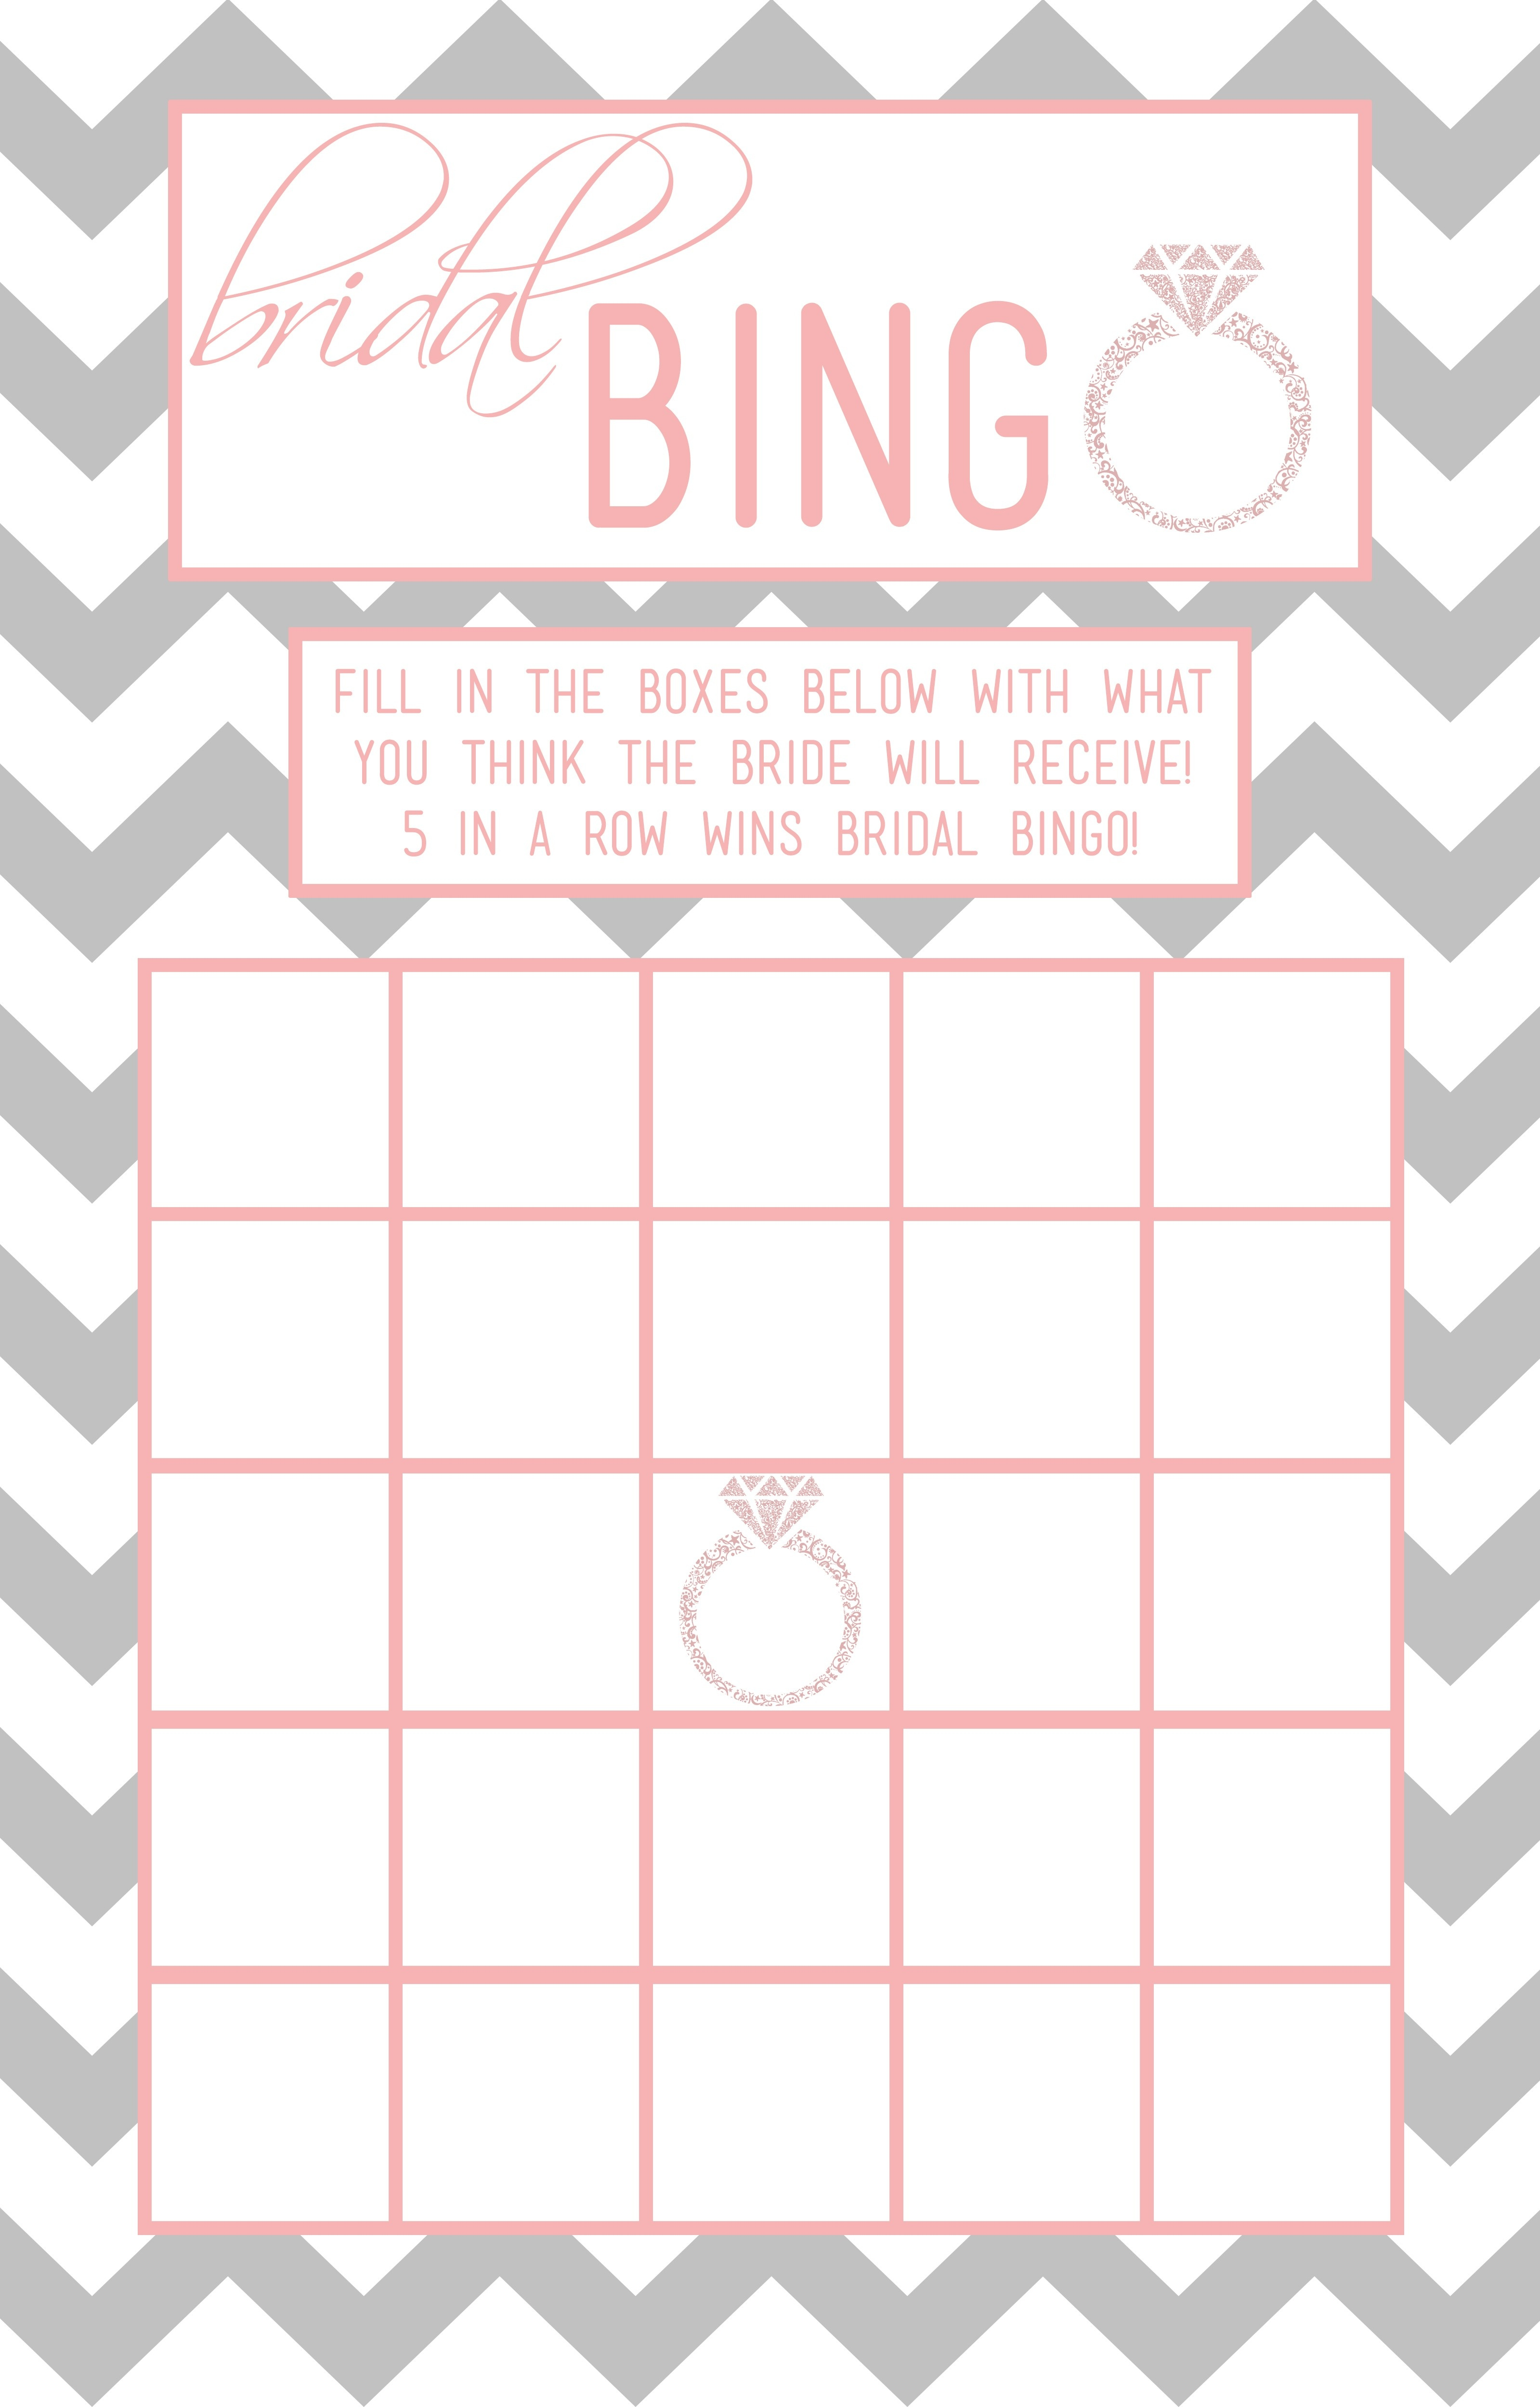 Bridal Shower Bingo Template   Madinbelgrade - Free Printable Bridal Shower Blank Bingo Games